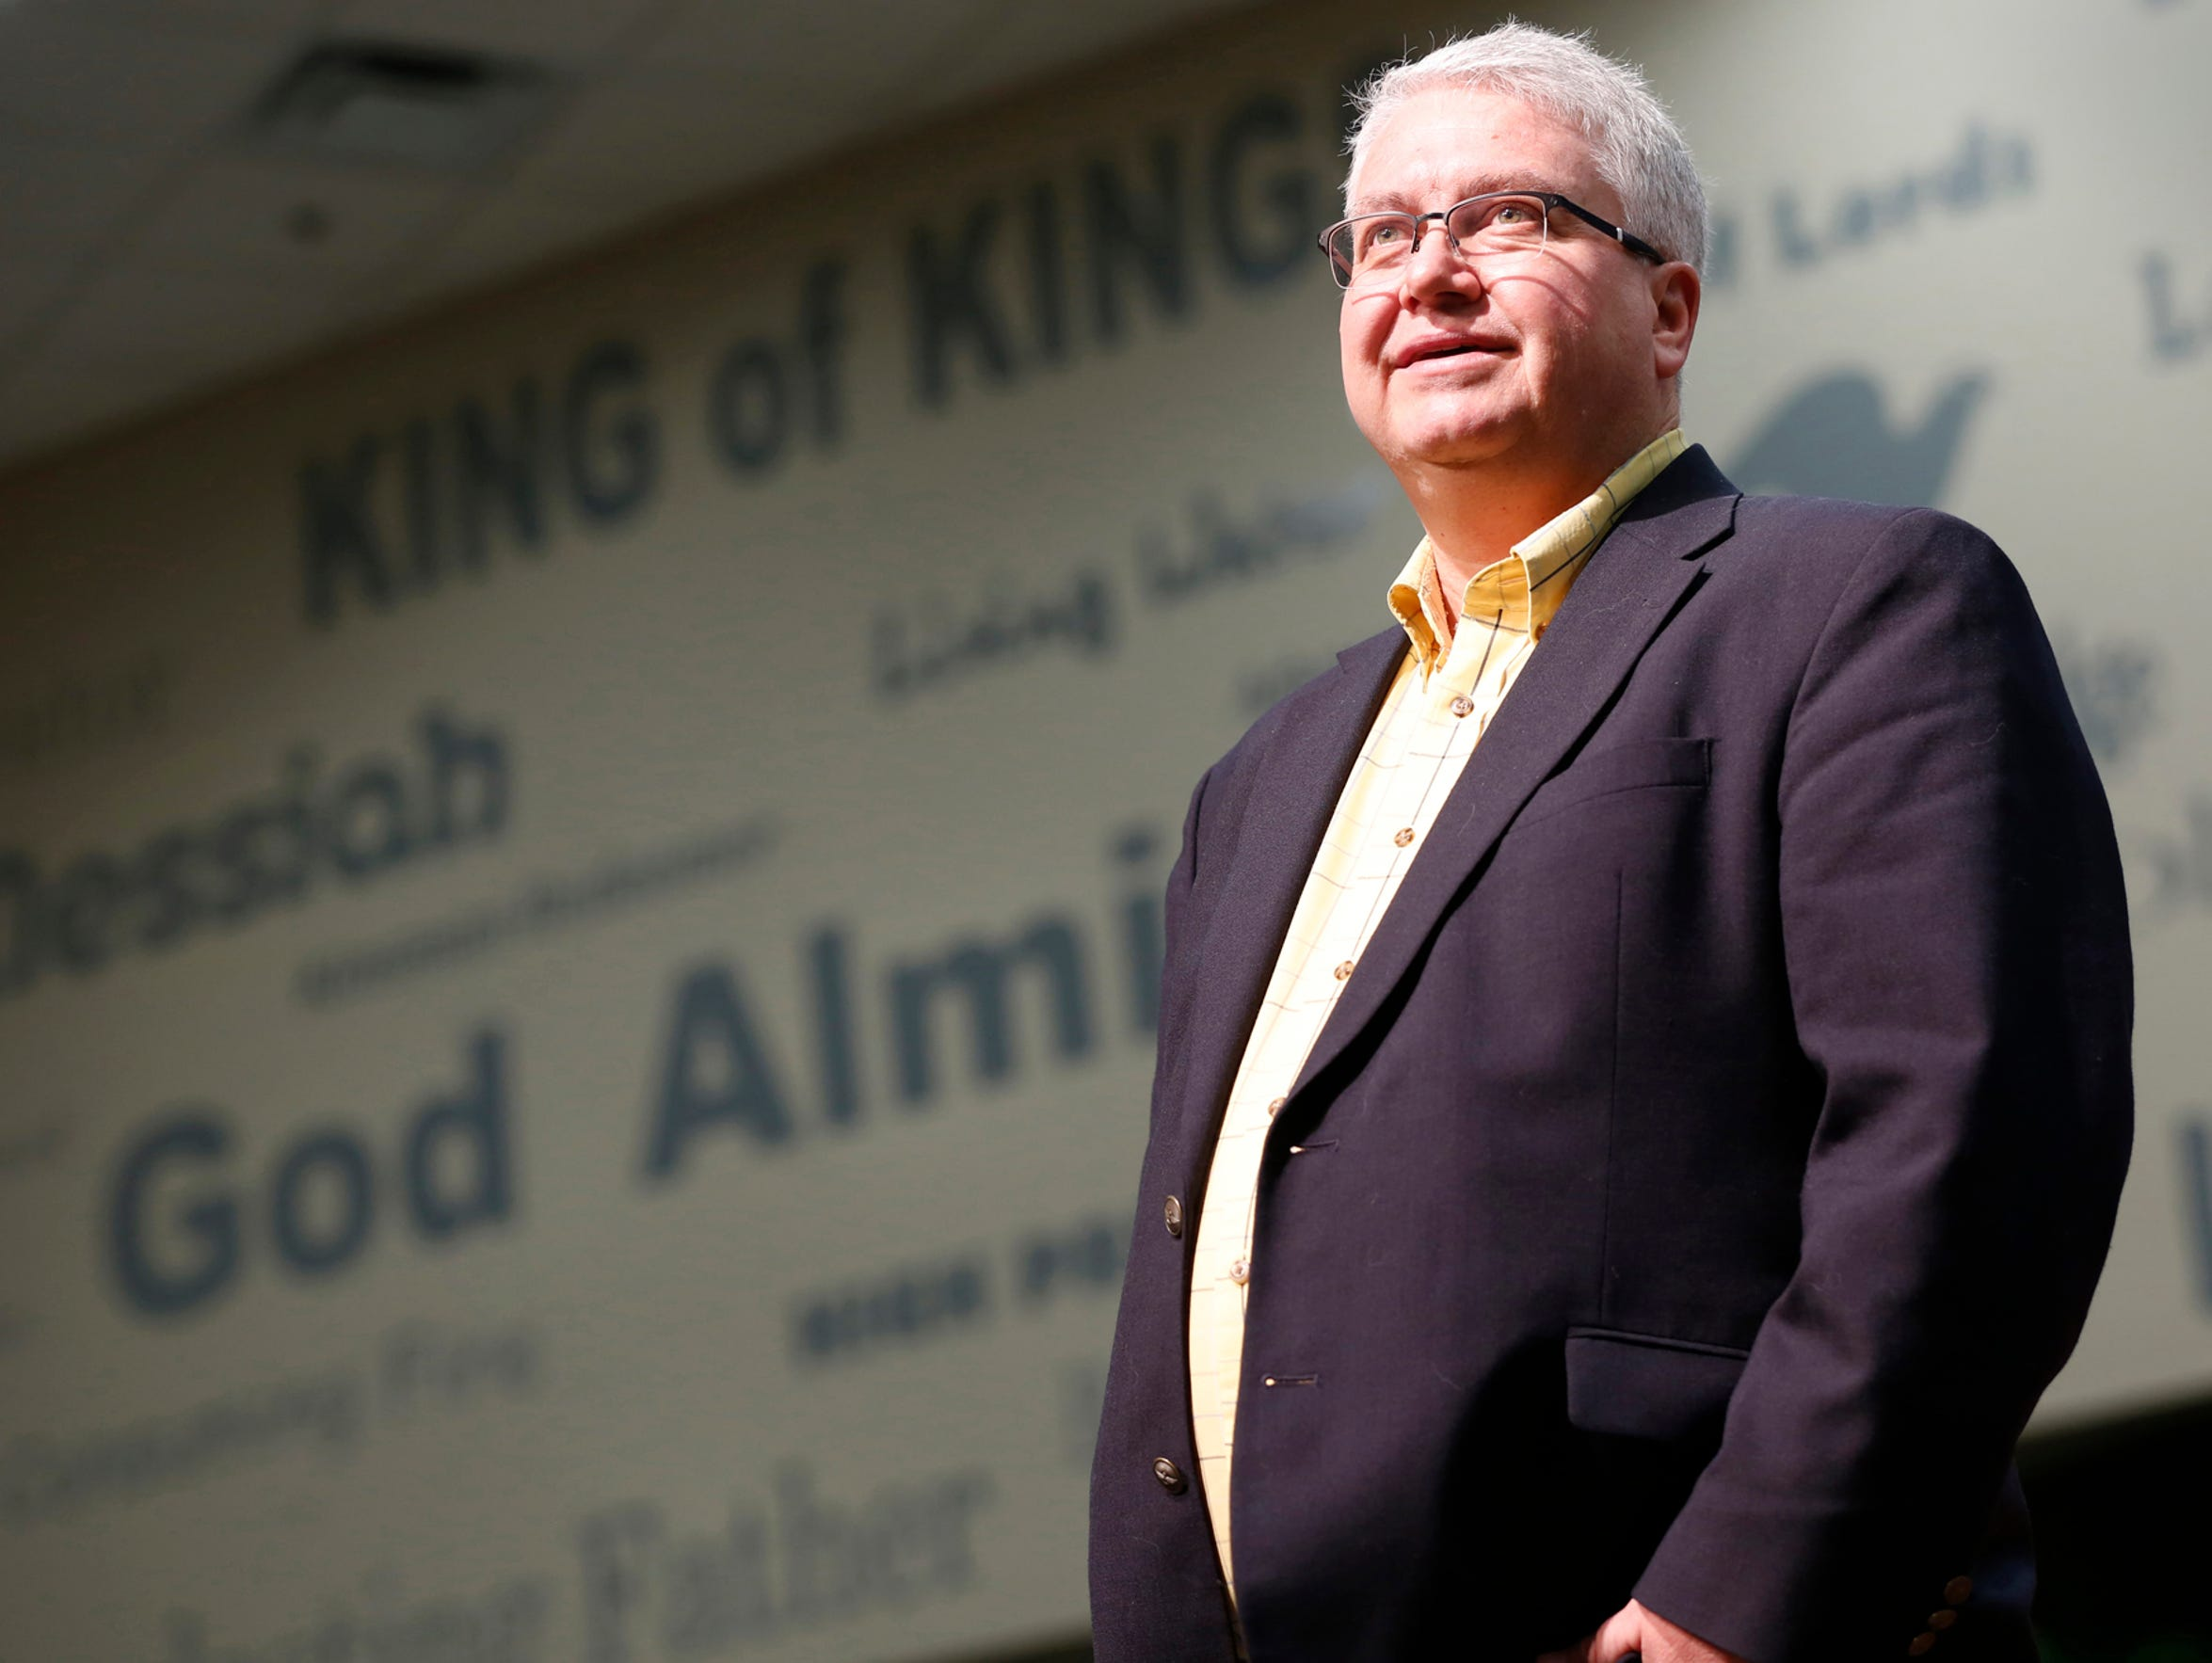 Pastor Todd Ladd of Delphi United Methodist Church